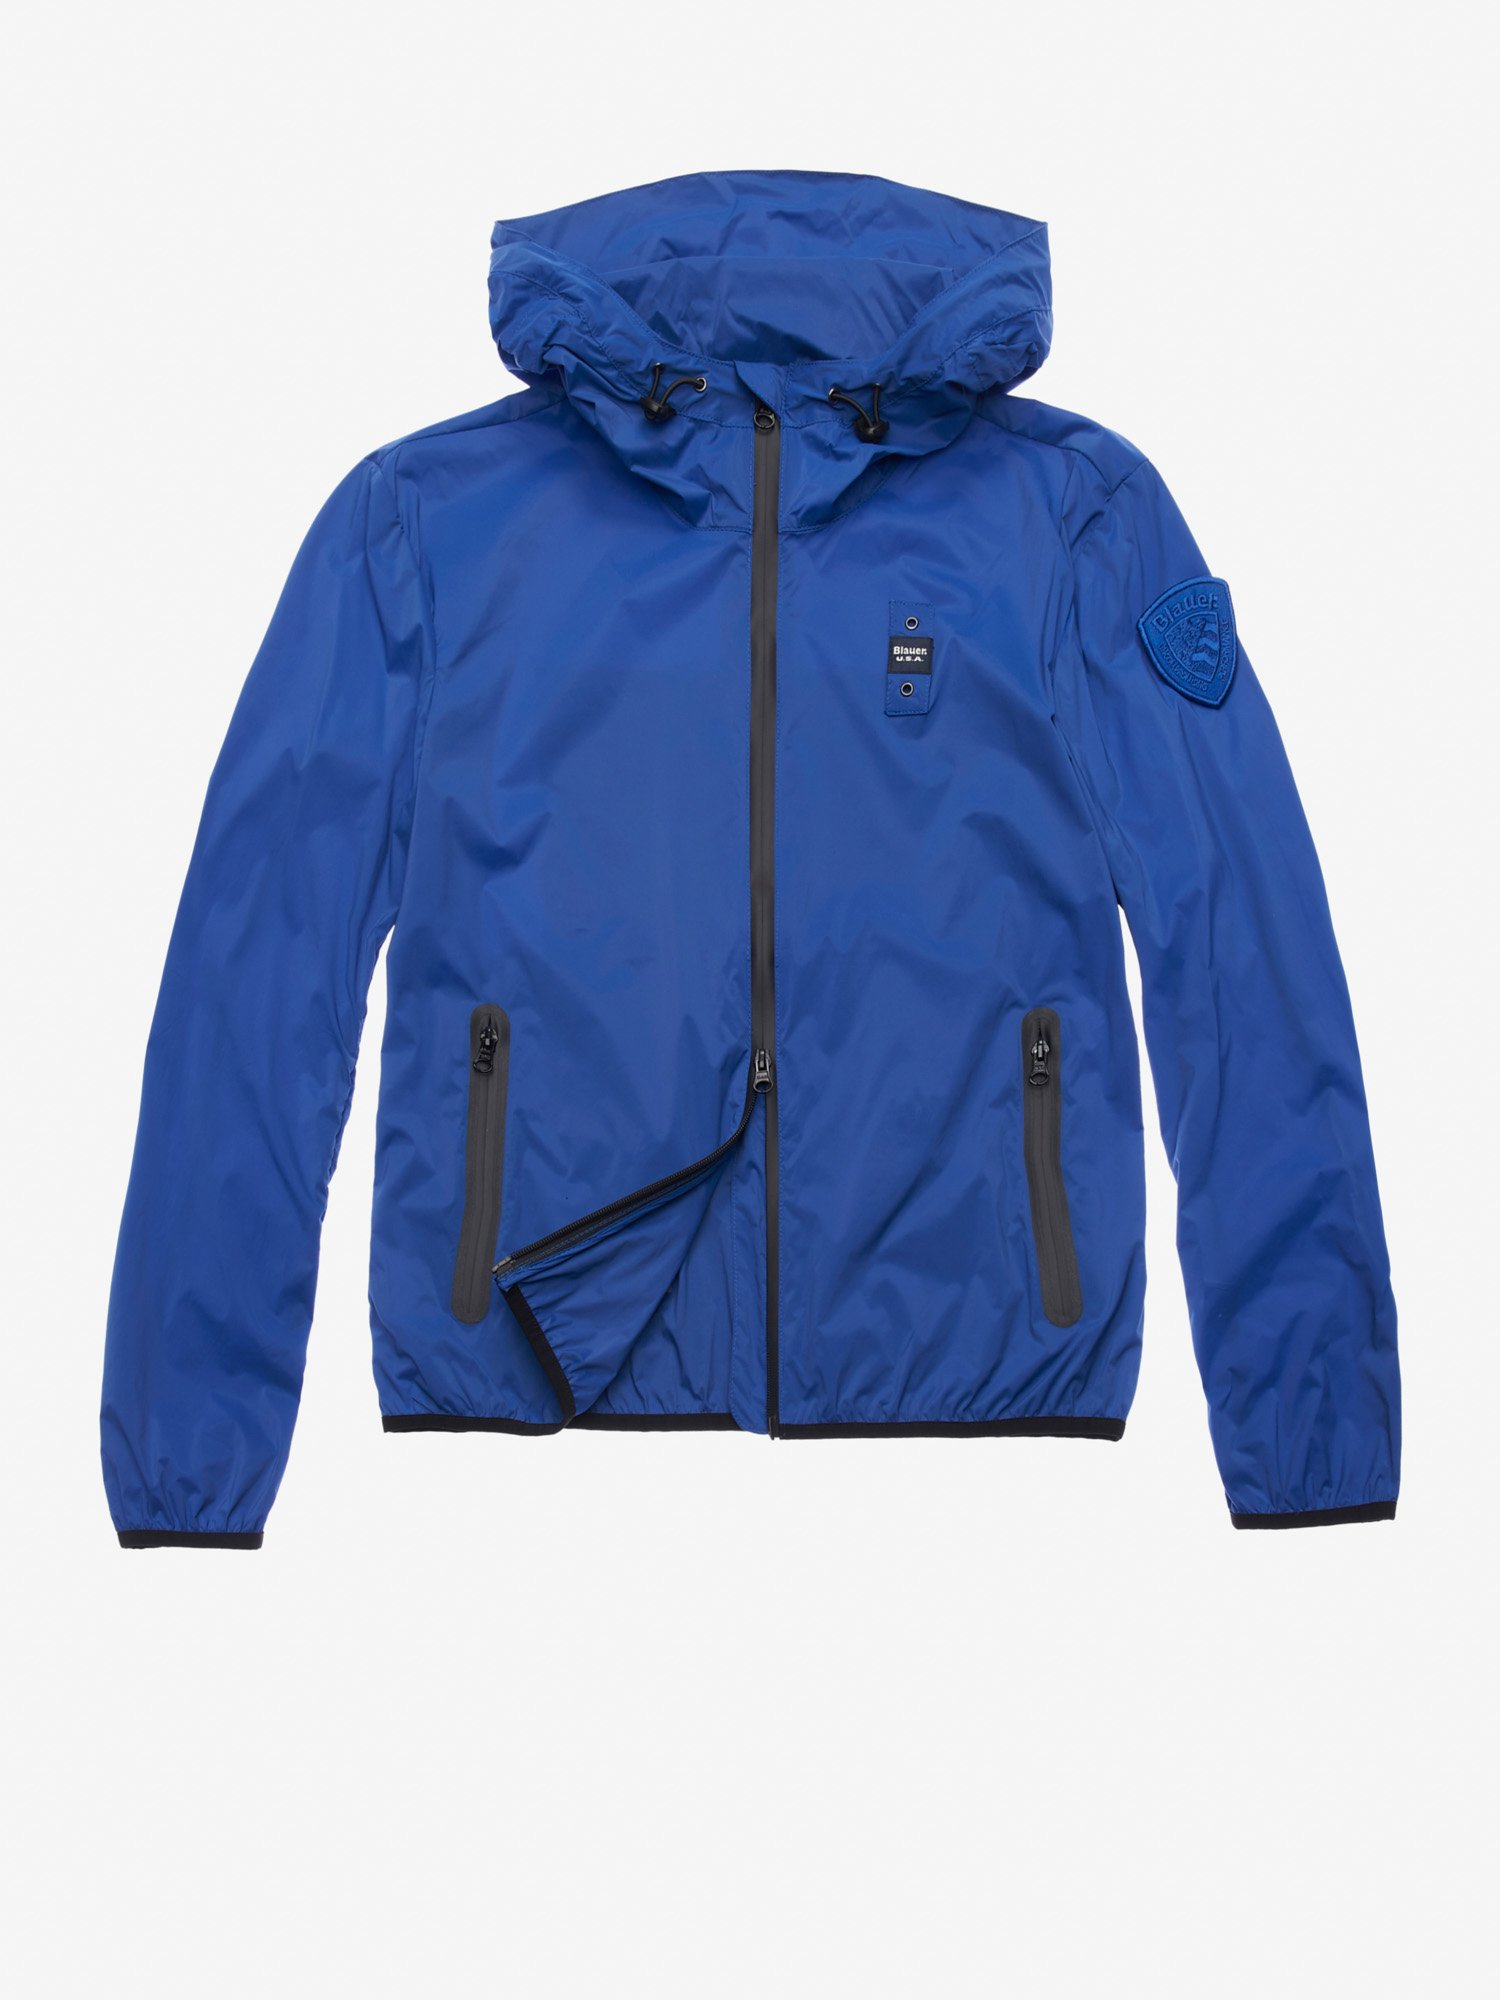 Blauer - JACKE NYLON-STRETCH ROSS - Ultramarinblau - Blauer